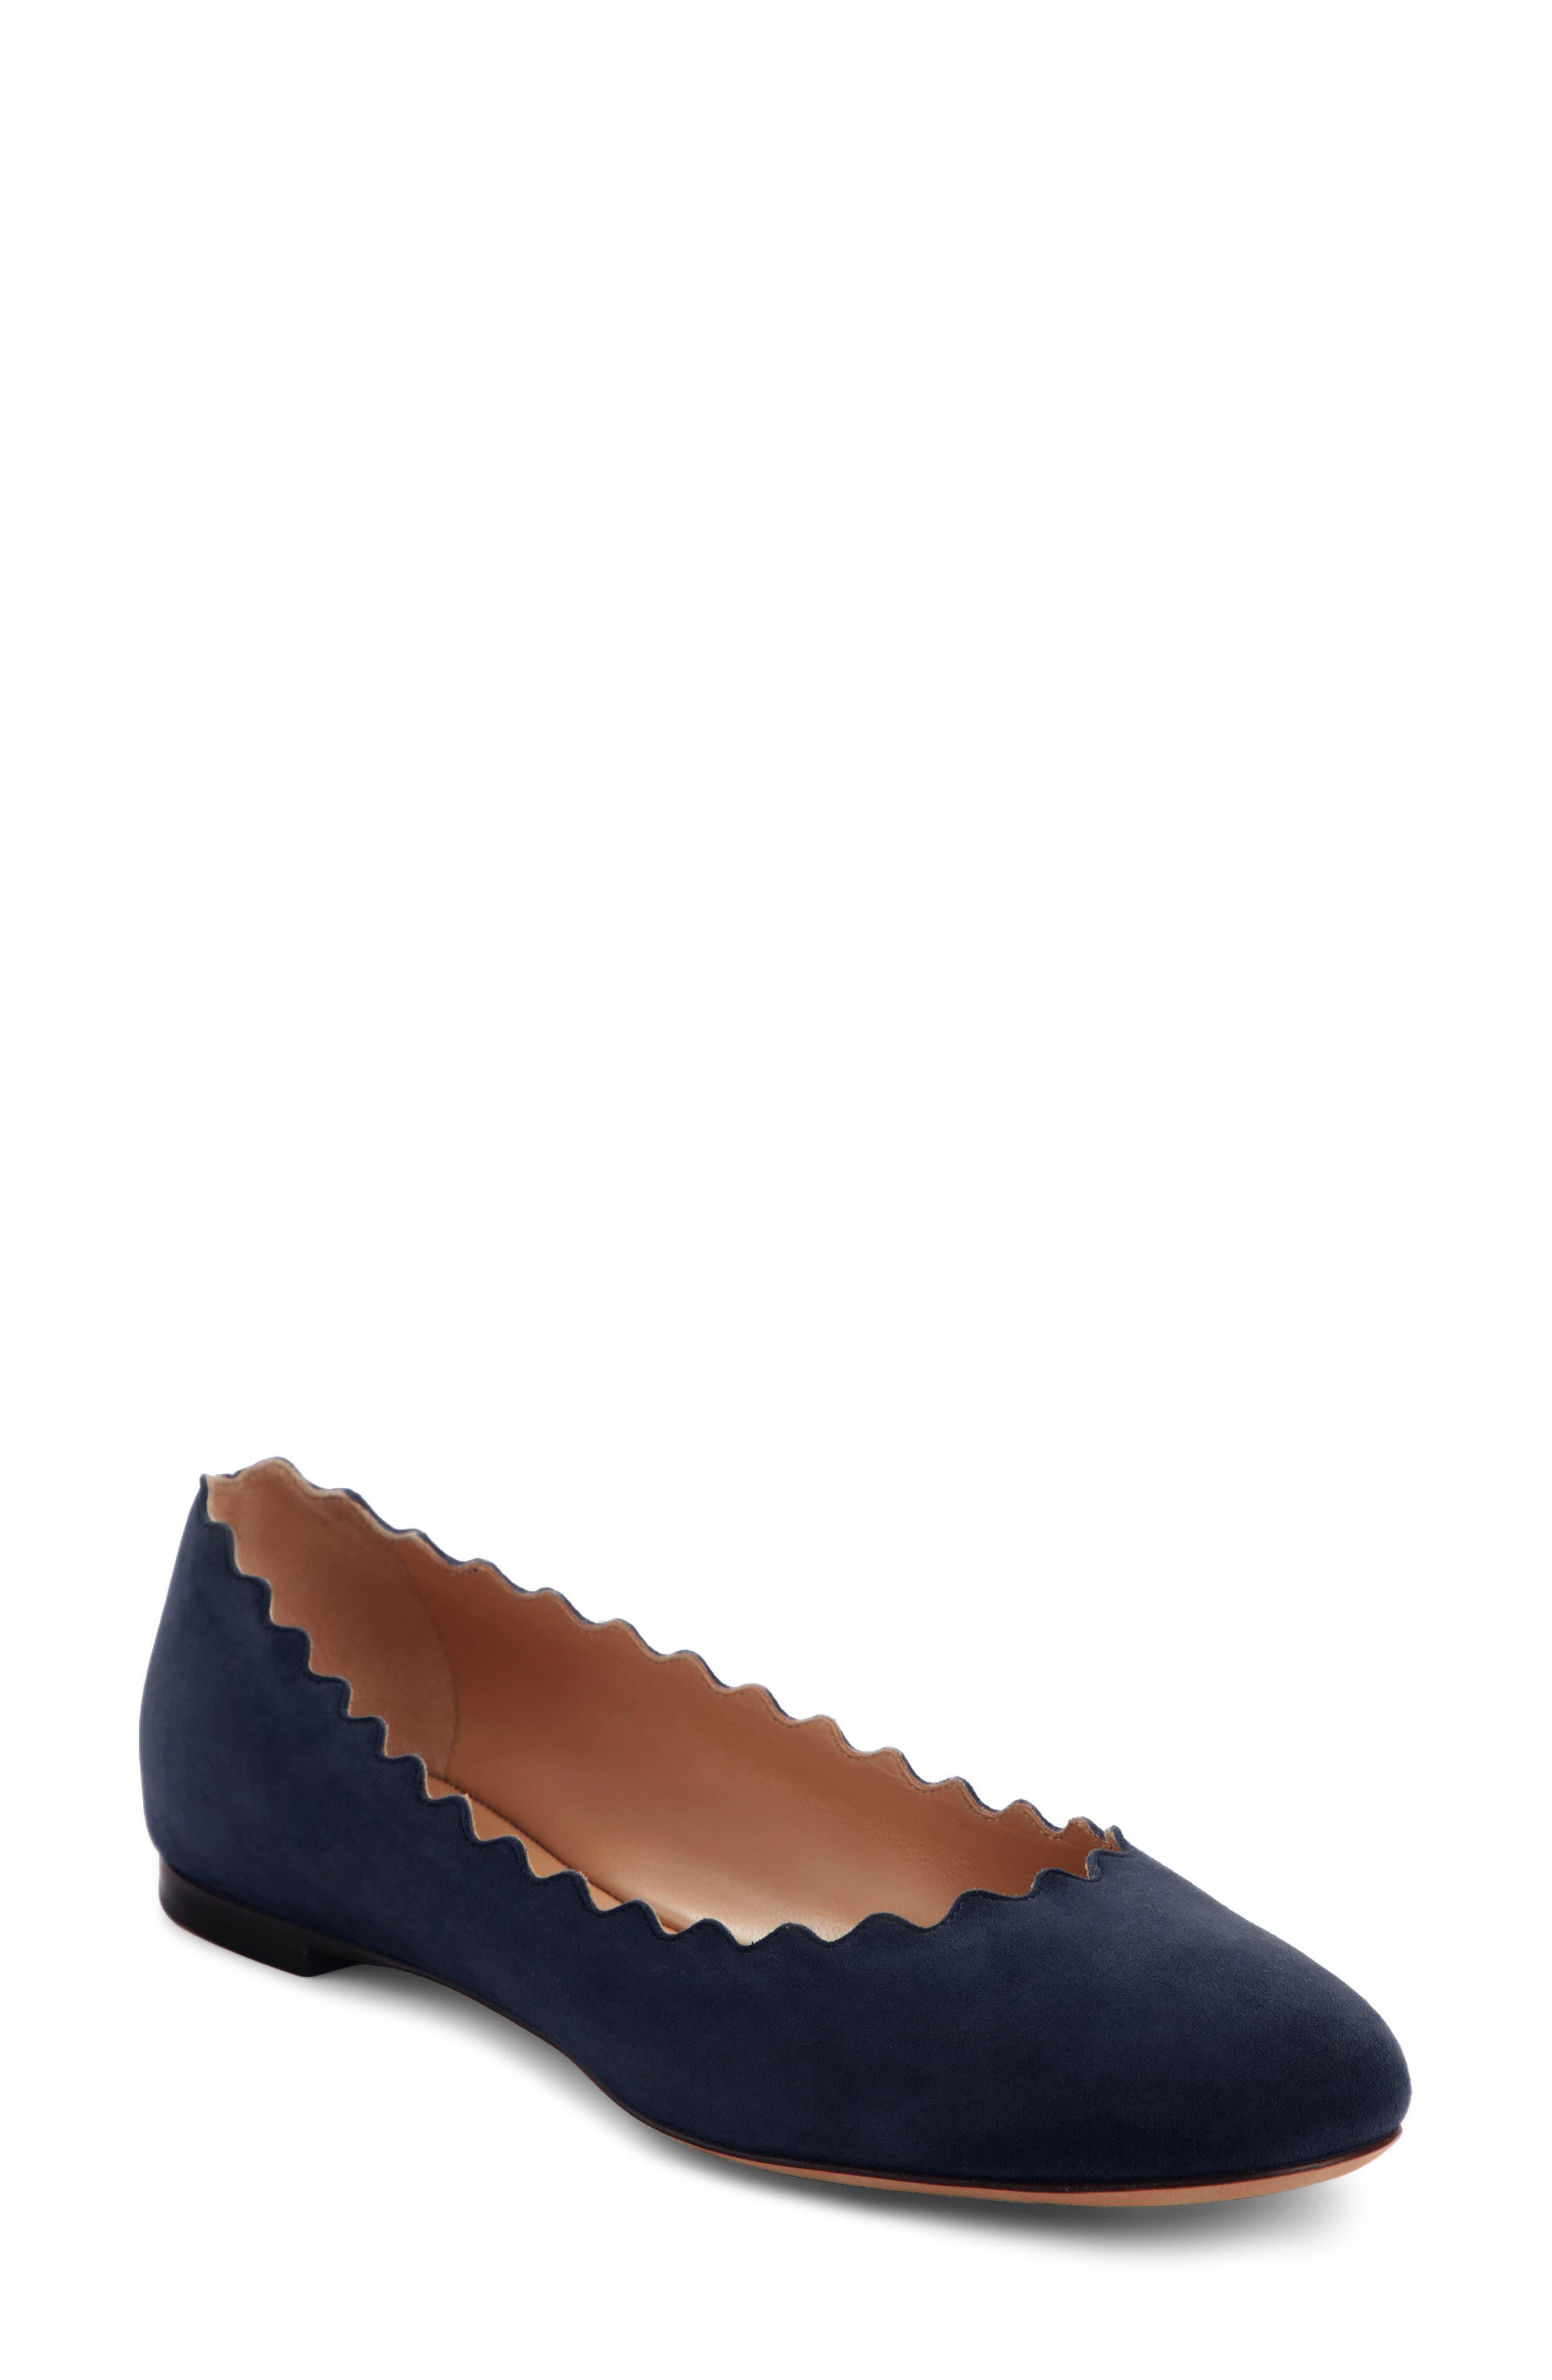 CHLOÉ, 'Lauren' Scalloped Ballet Flat, Main thumbnail 1, color, MAJOLICA BLUE